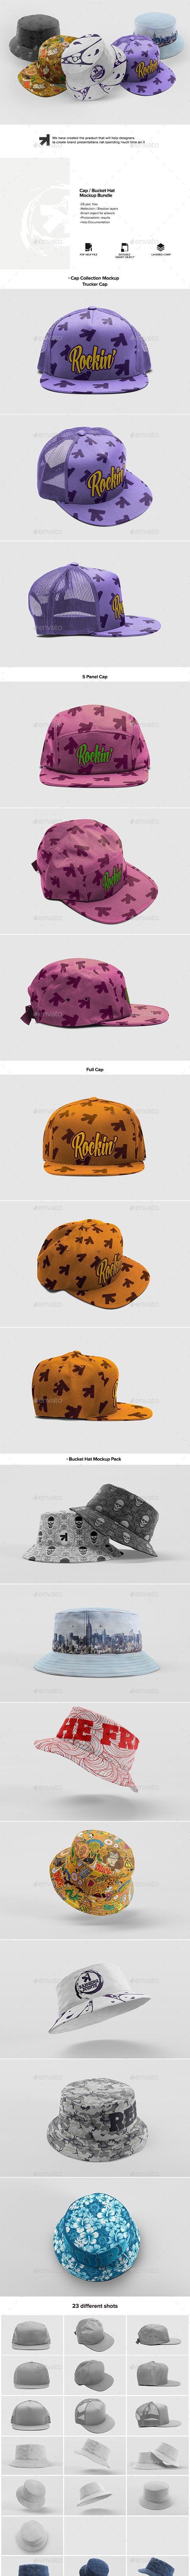 Cap Bucket Hat Mockup Bundle - Miscellaneous Apparel